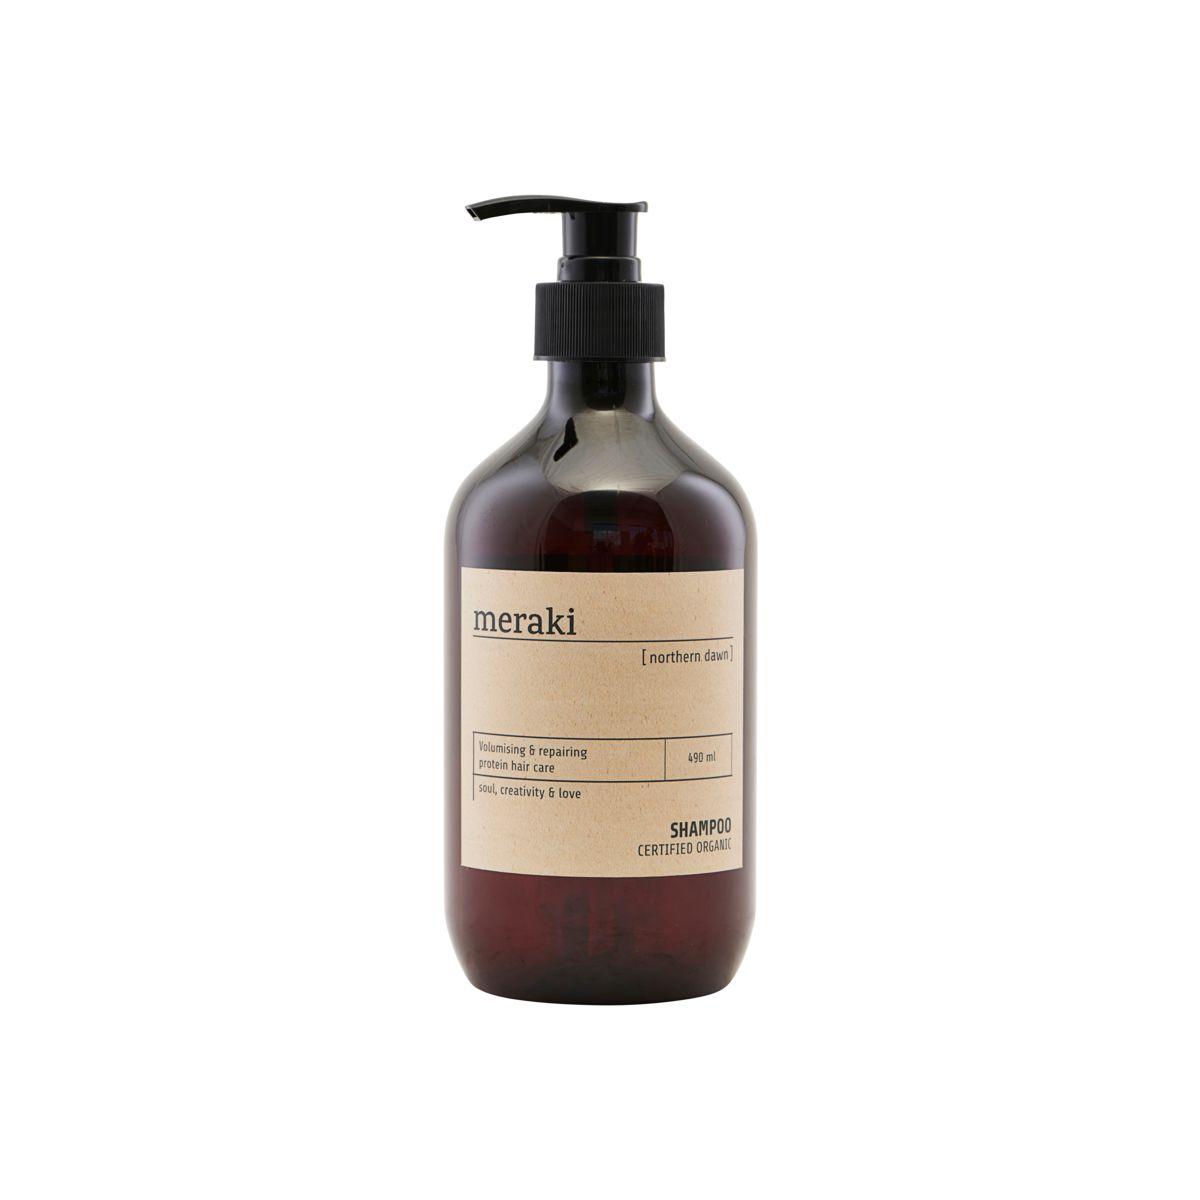 Meraki Northern Dawn Shampoo, 490 ml